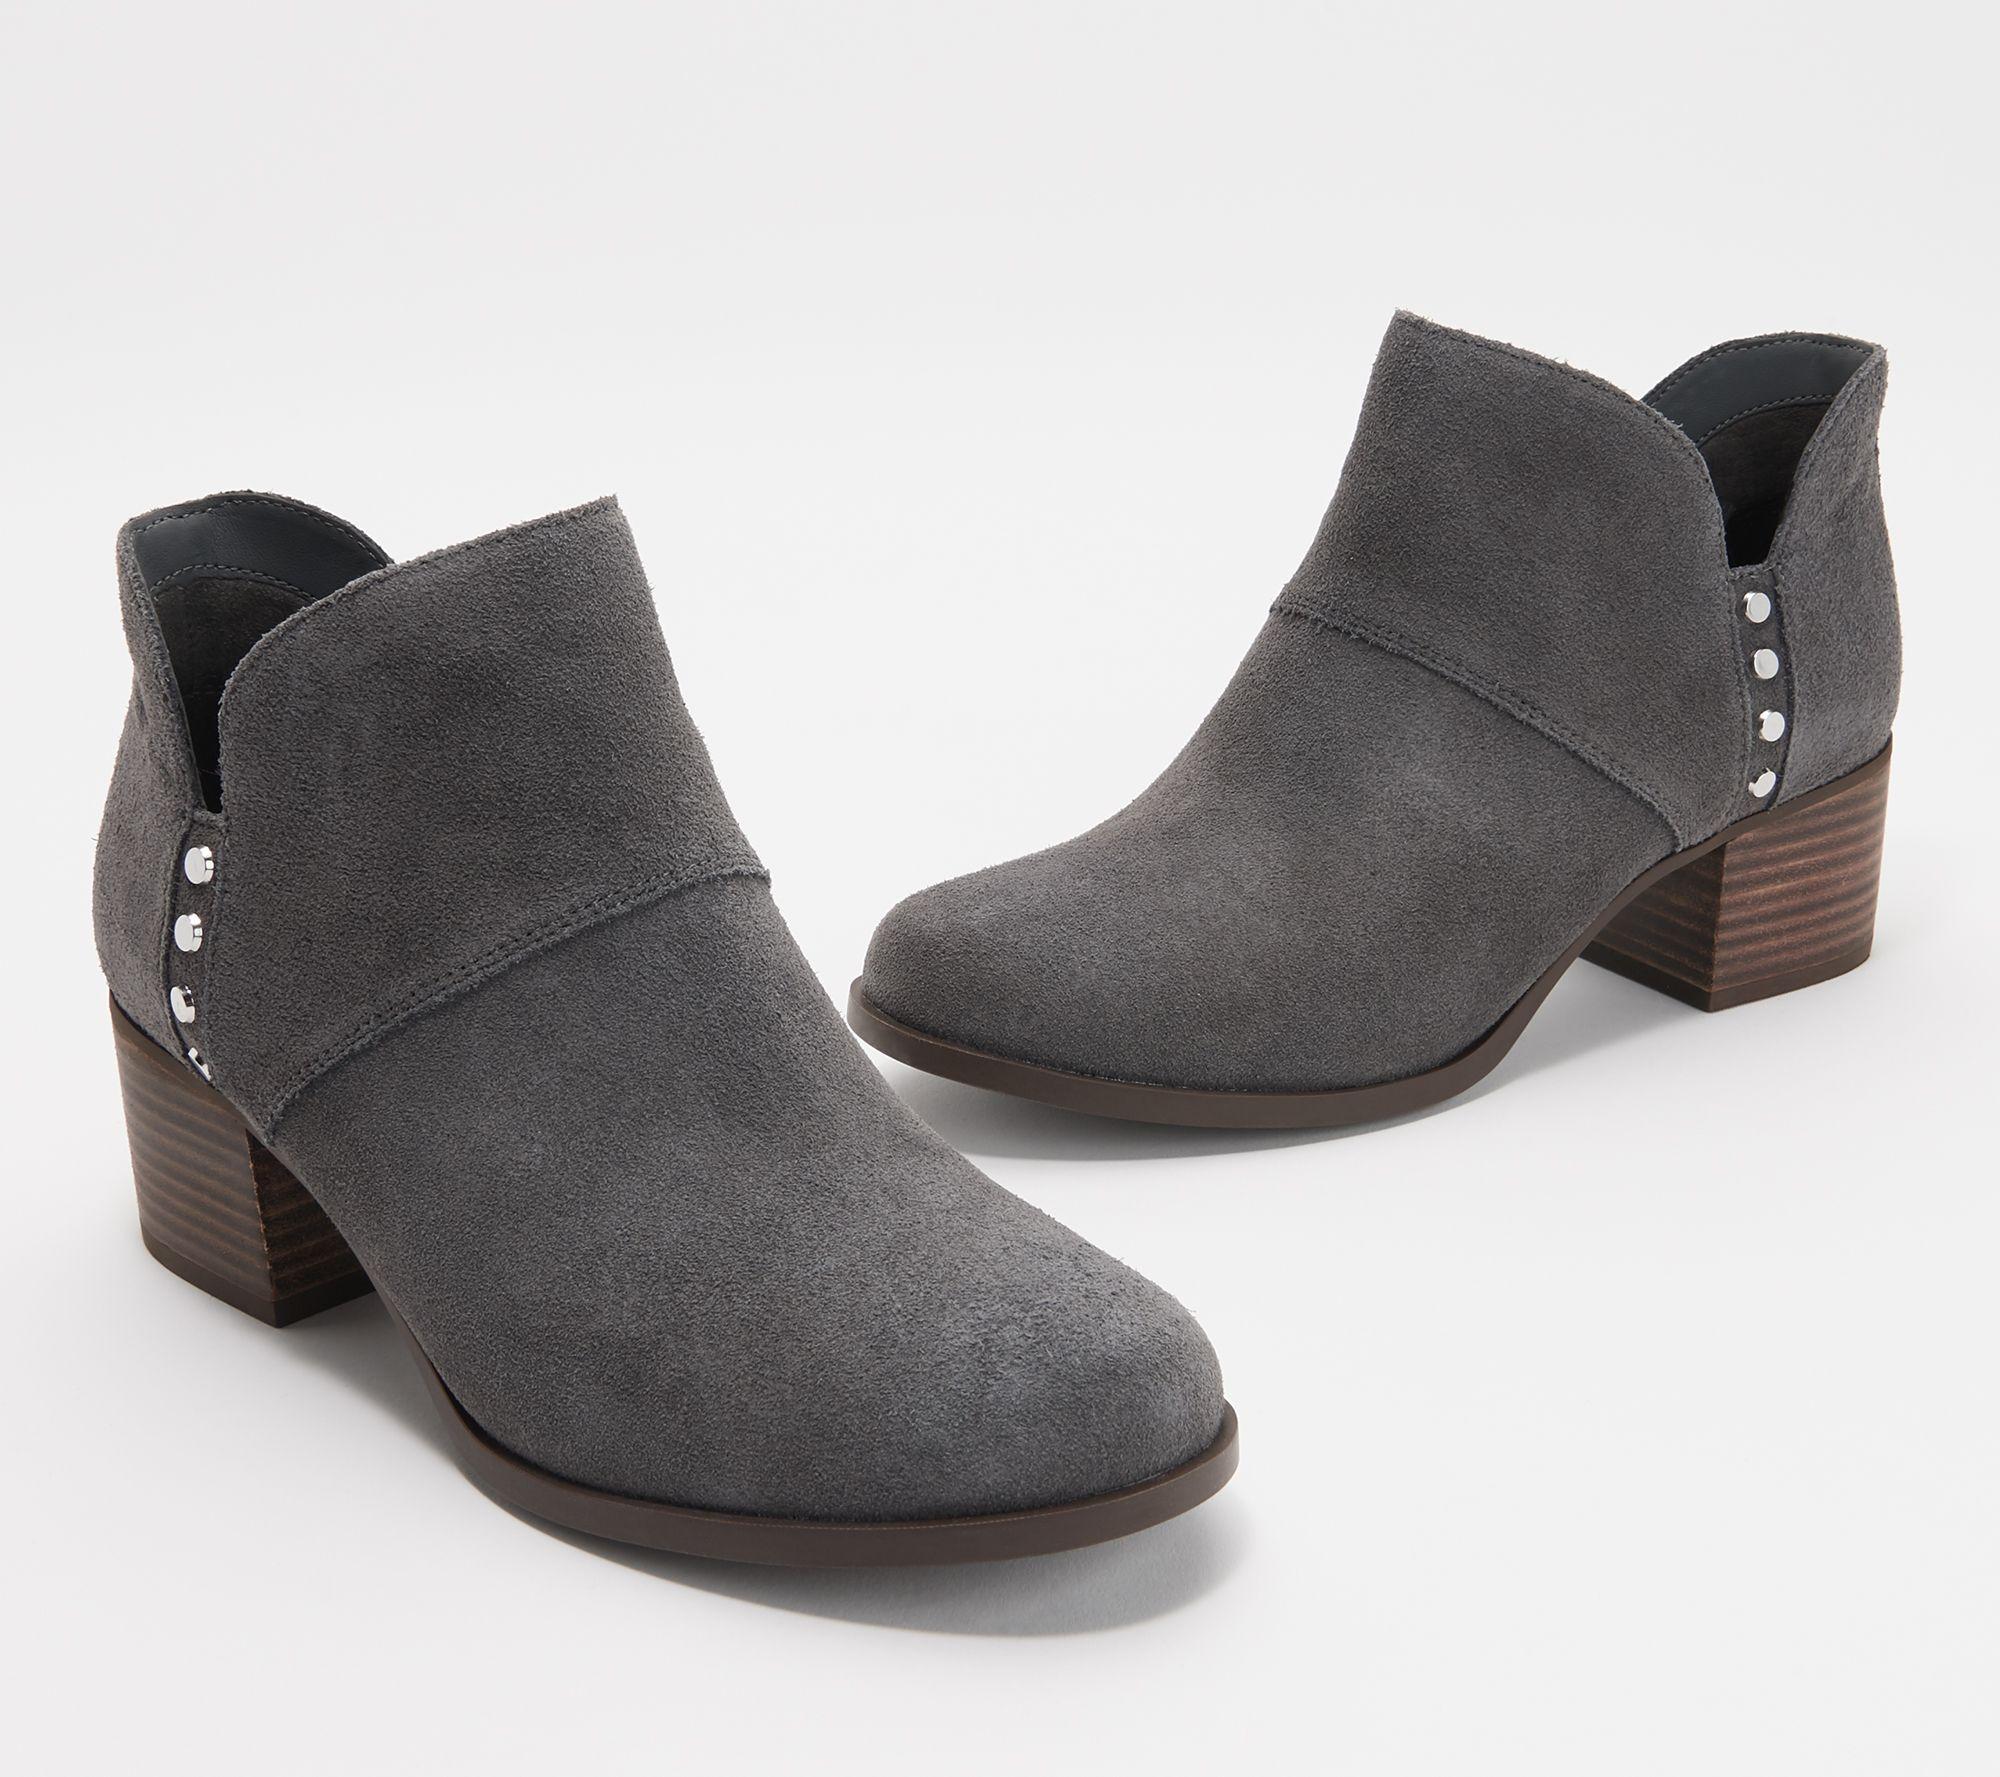 327bb932ebb Koolaburra by UGG Suede Studded Ankle Boots - Sofiya — QVC.com